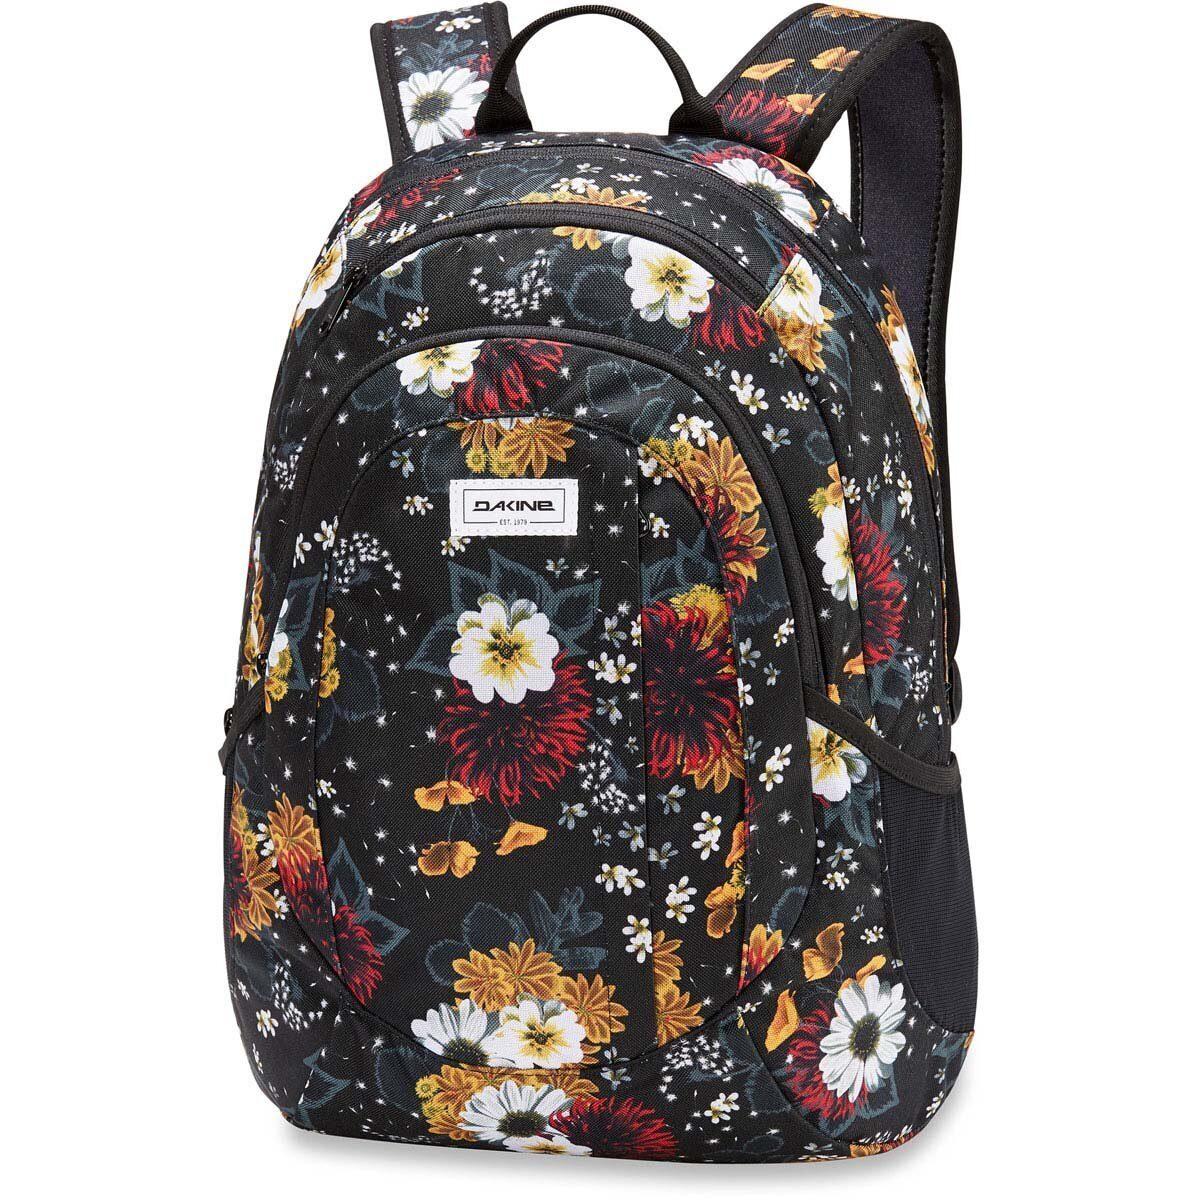 56415ed725a0 Женский рюкзак Dakine Garden 20L Winter Daisy